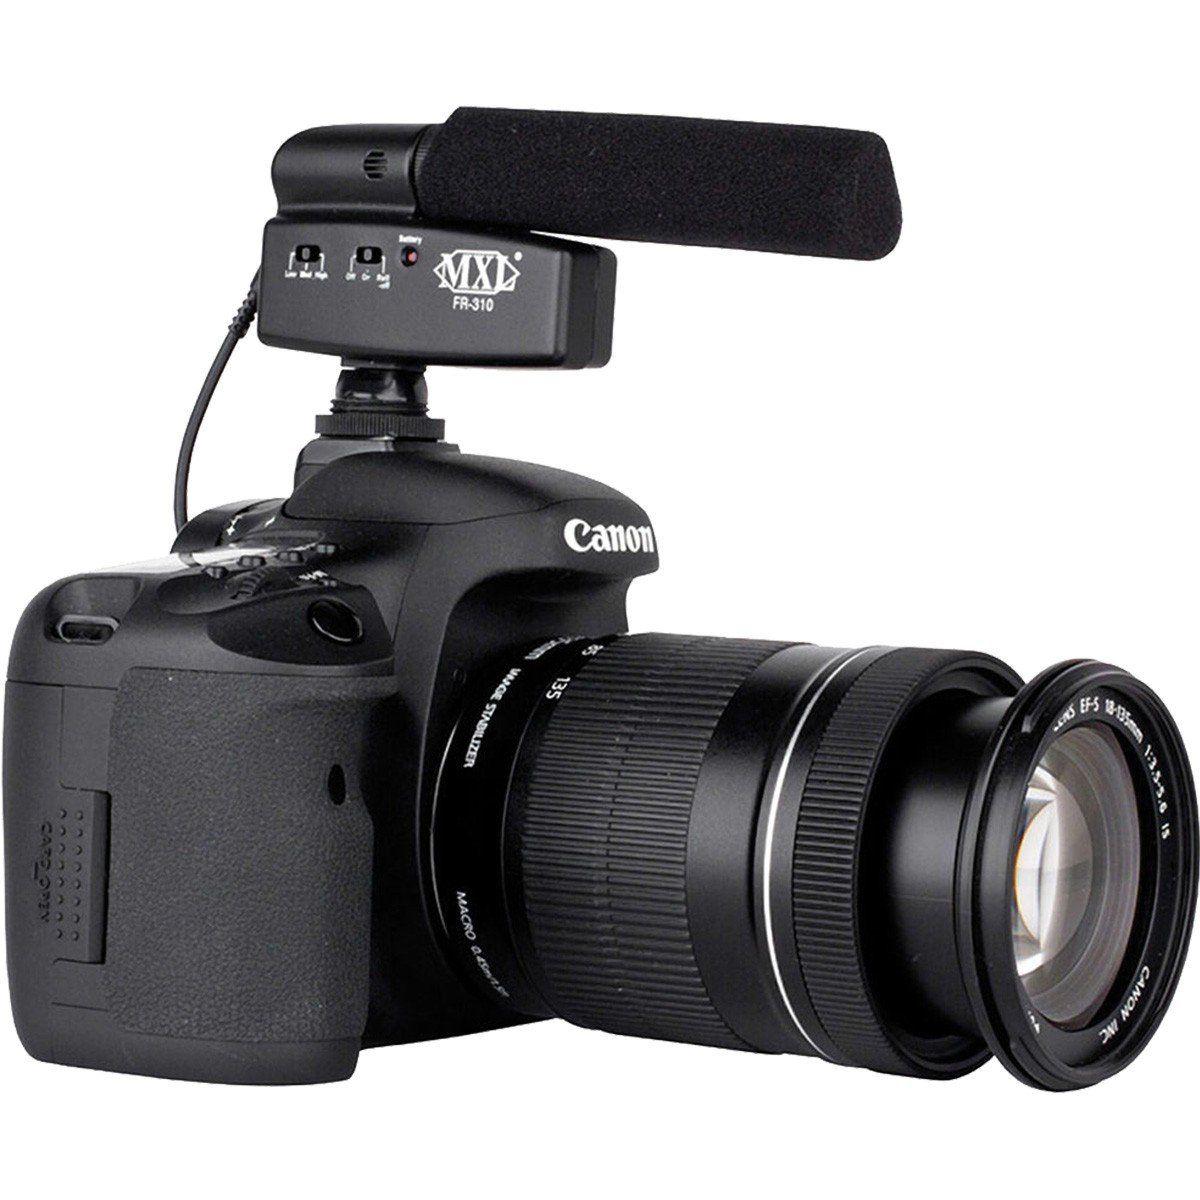 Mxl FR-310 Microfone Shotgun Mxl FR 310 para Câmera e Vídeo